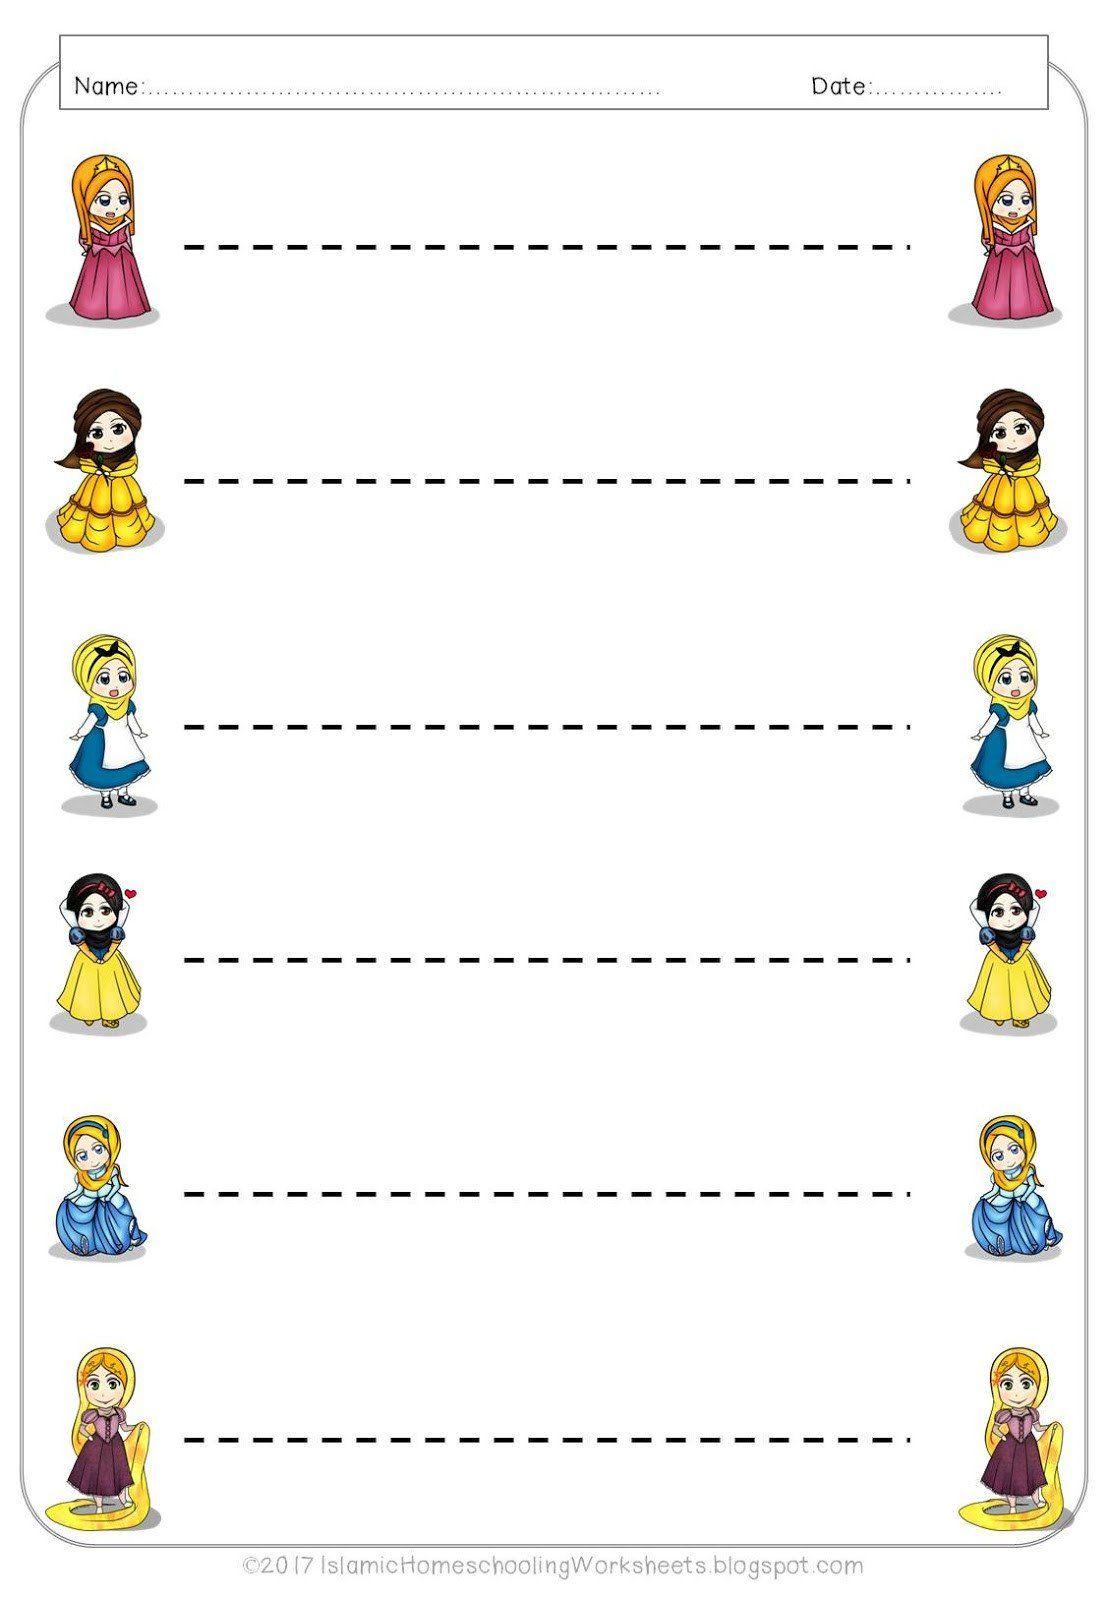 Princess Worksheets For Preschool Princess Preschool